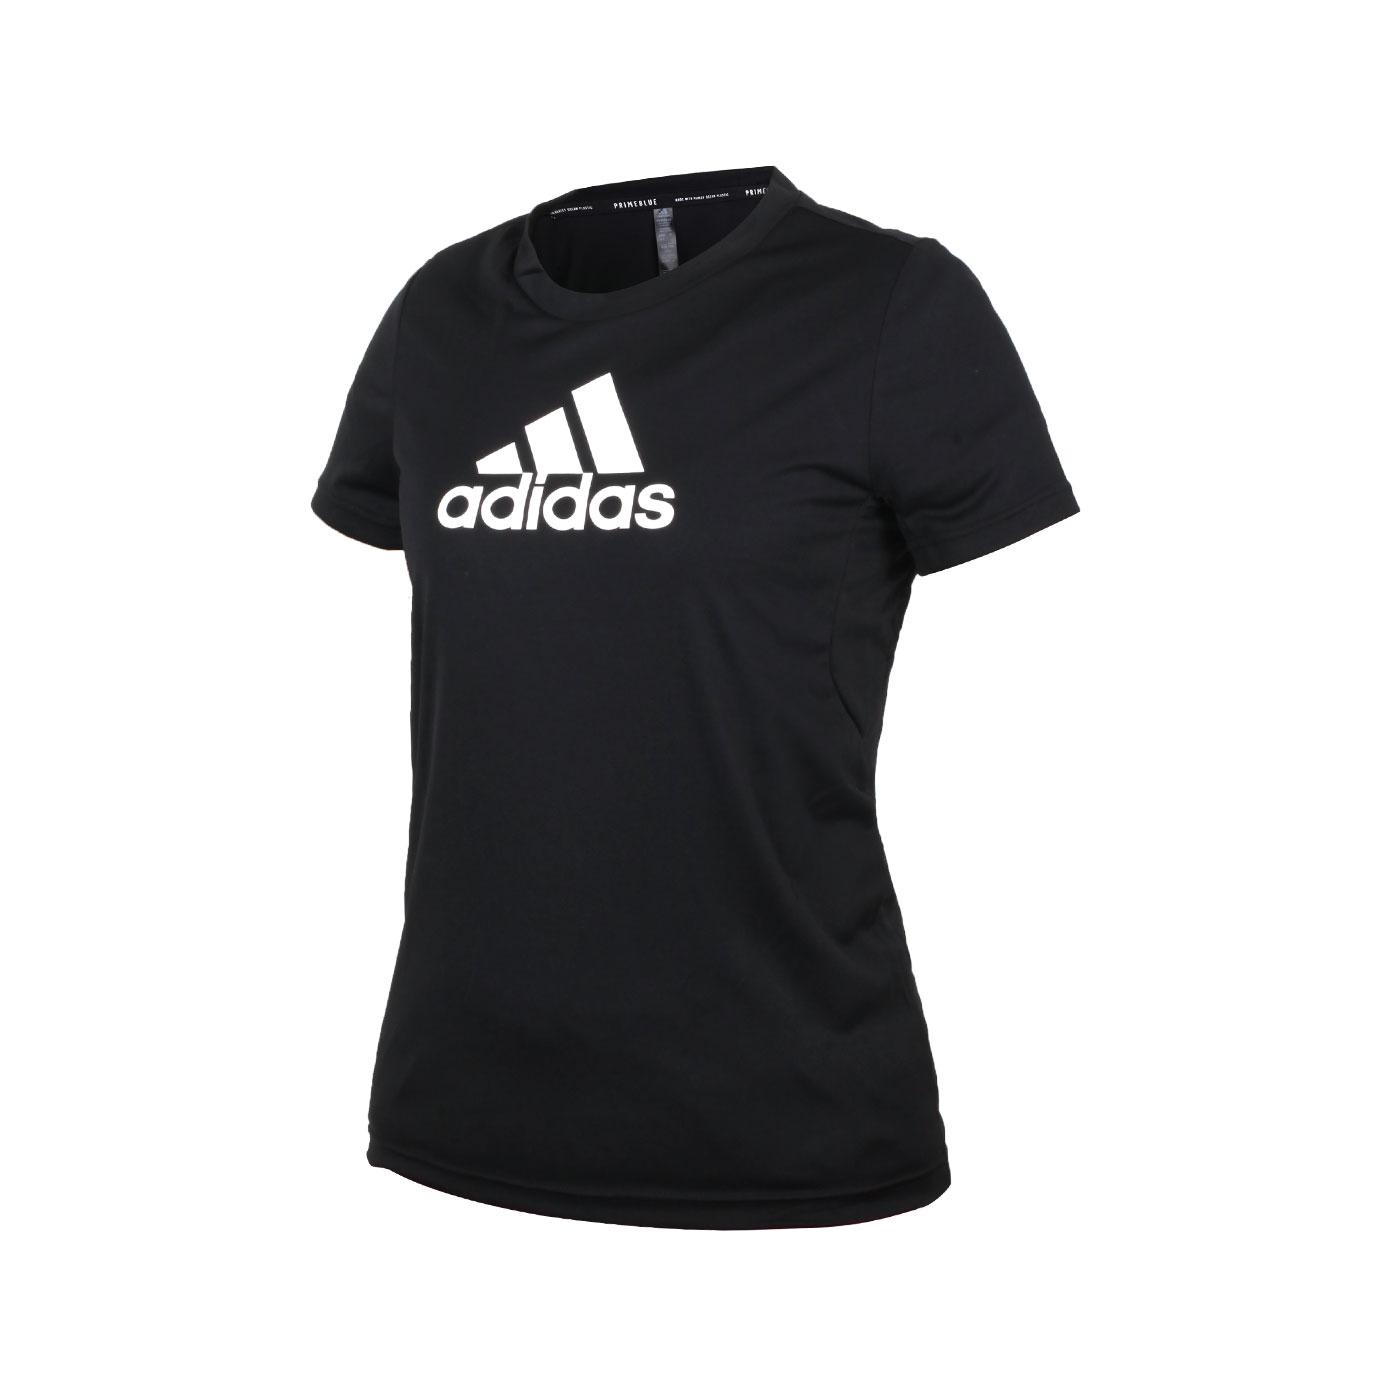 ADIDAS 女款短袖T恤 GL3820 - 黑白